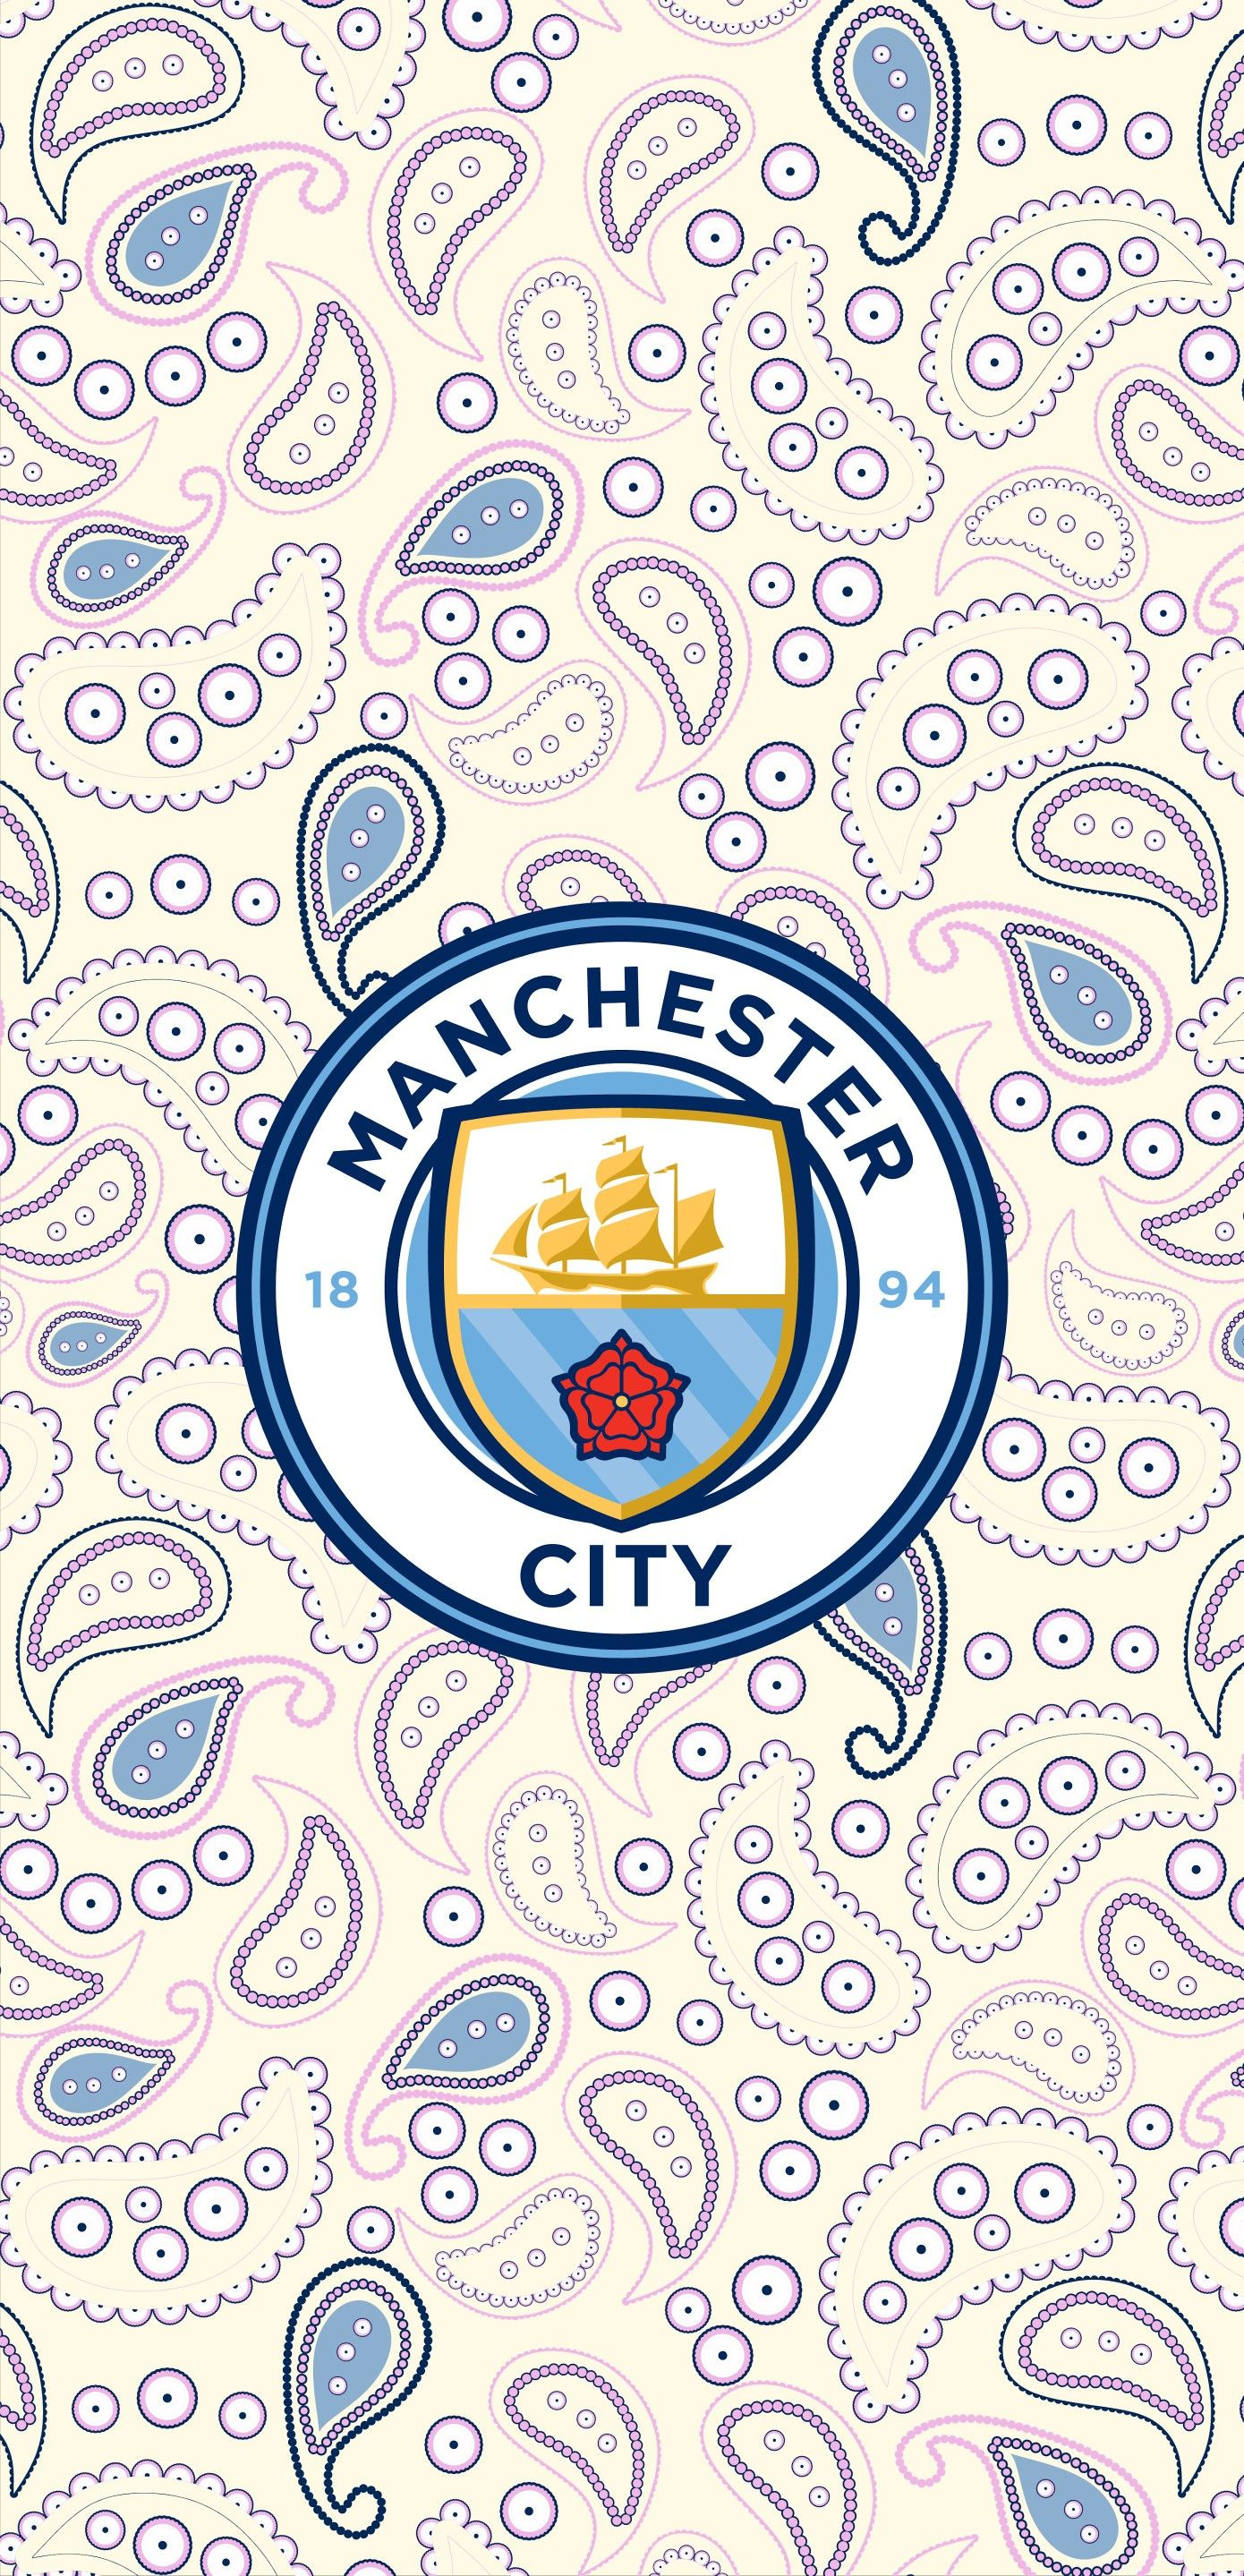 200 Manchester City Wallpaper Ideas In 2021 Manchester City Wallpaper Manchester City City Wallpaper